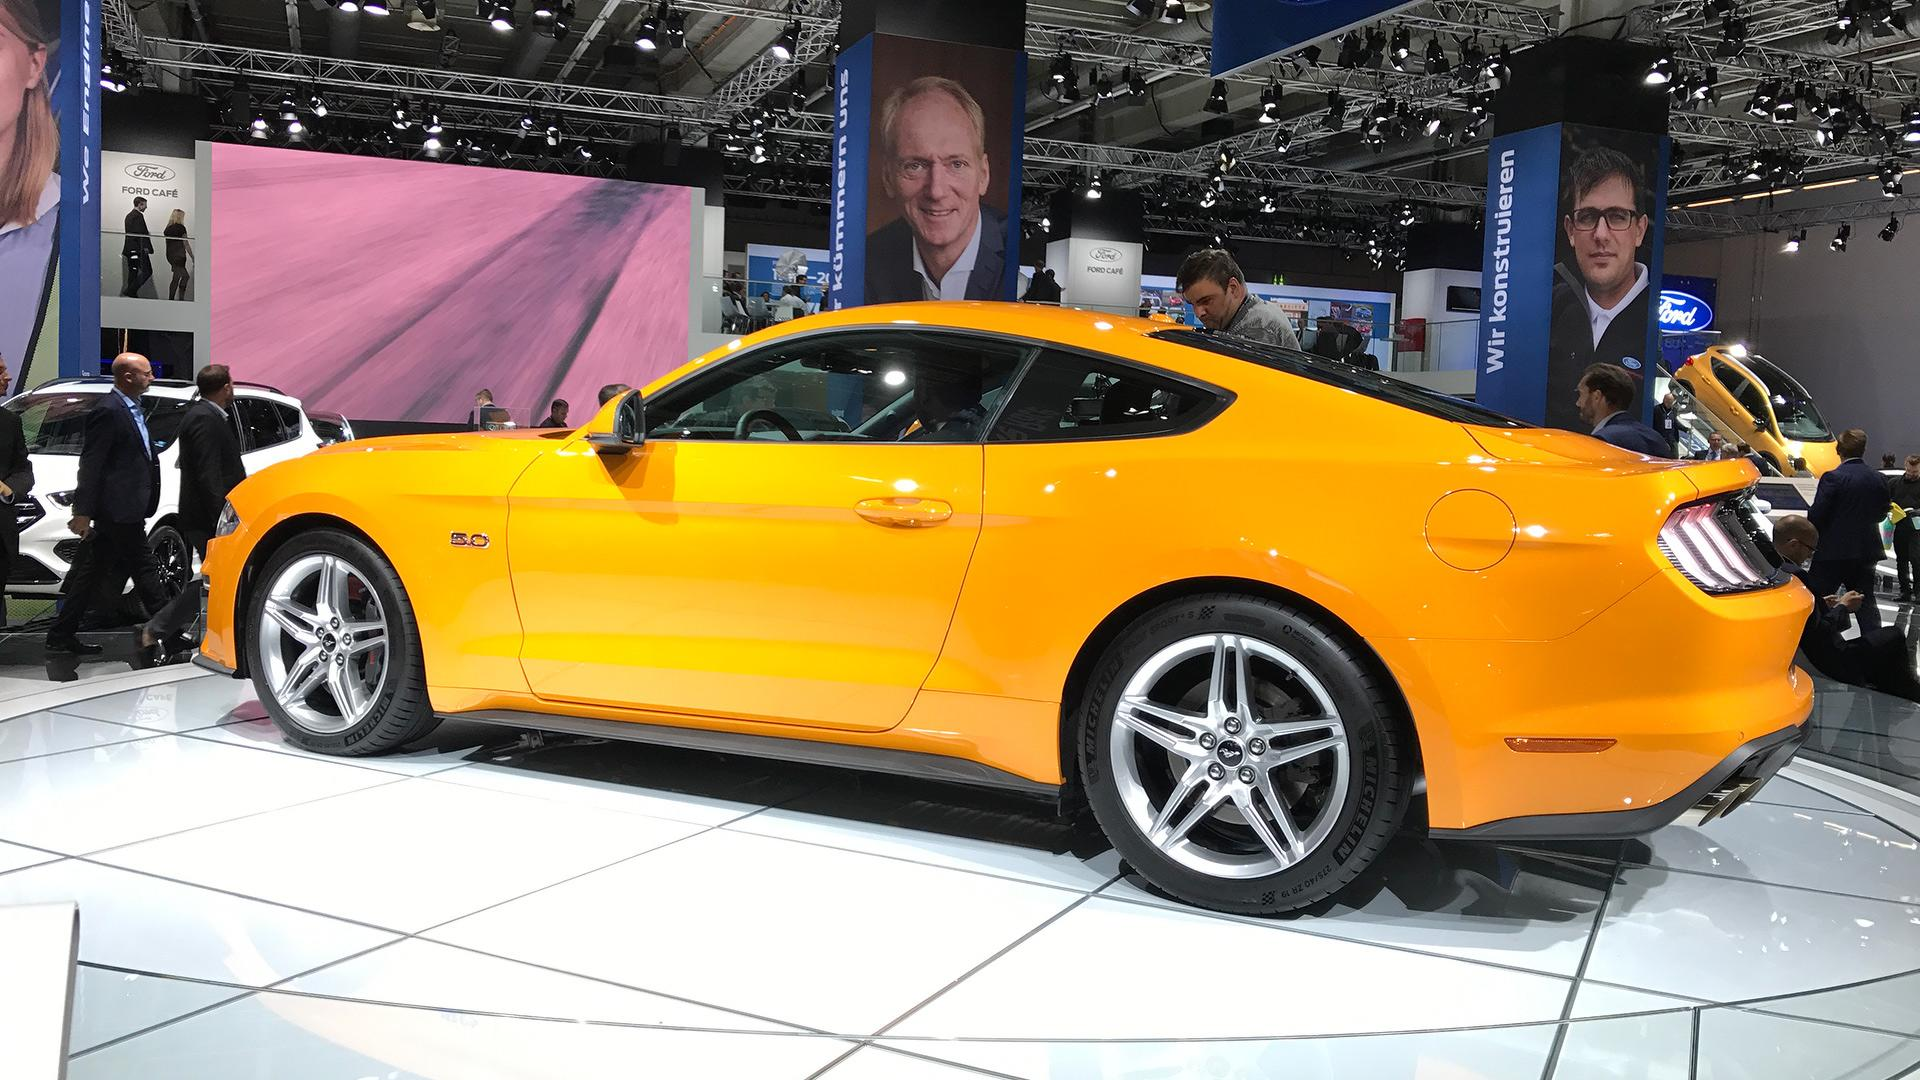 5ad5991168e33 ford mustang 2018 live in frankfurt فورد موستانگ پرفروشترین خودرو سال ۲۰۱۷ بود   اجاره ماشین